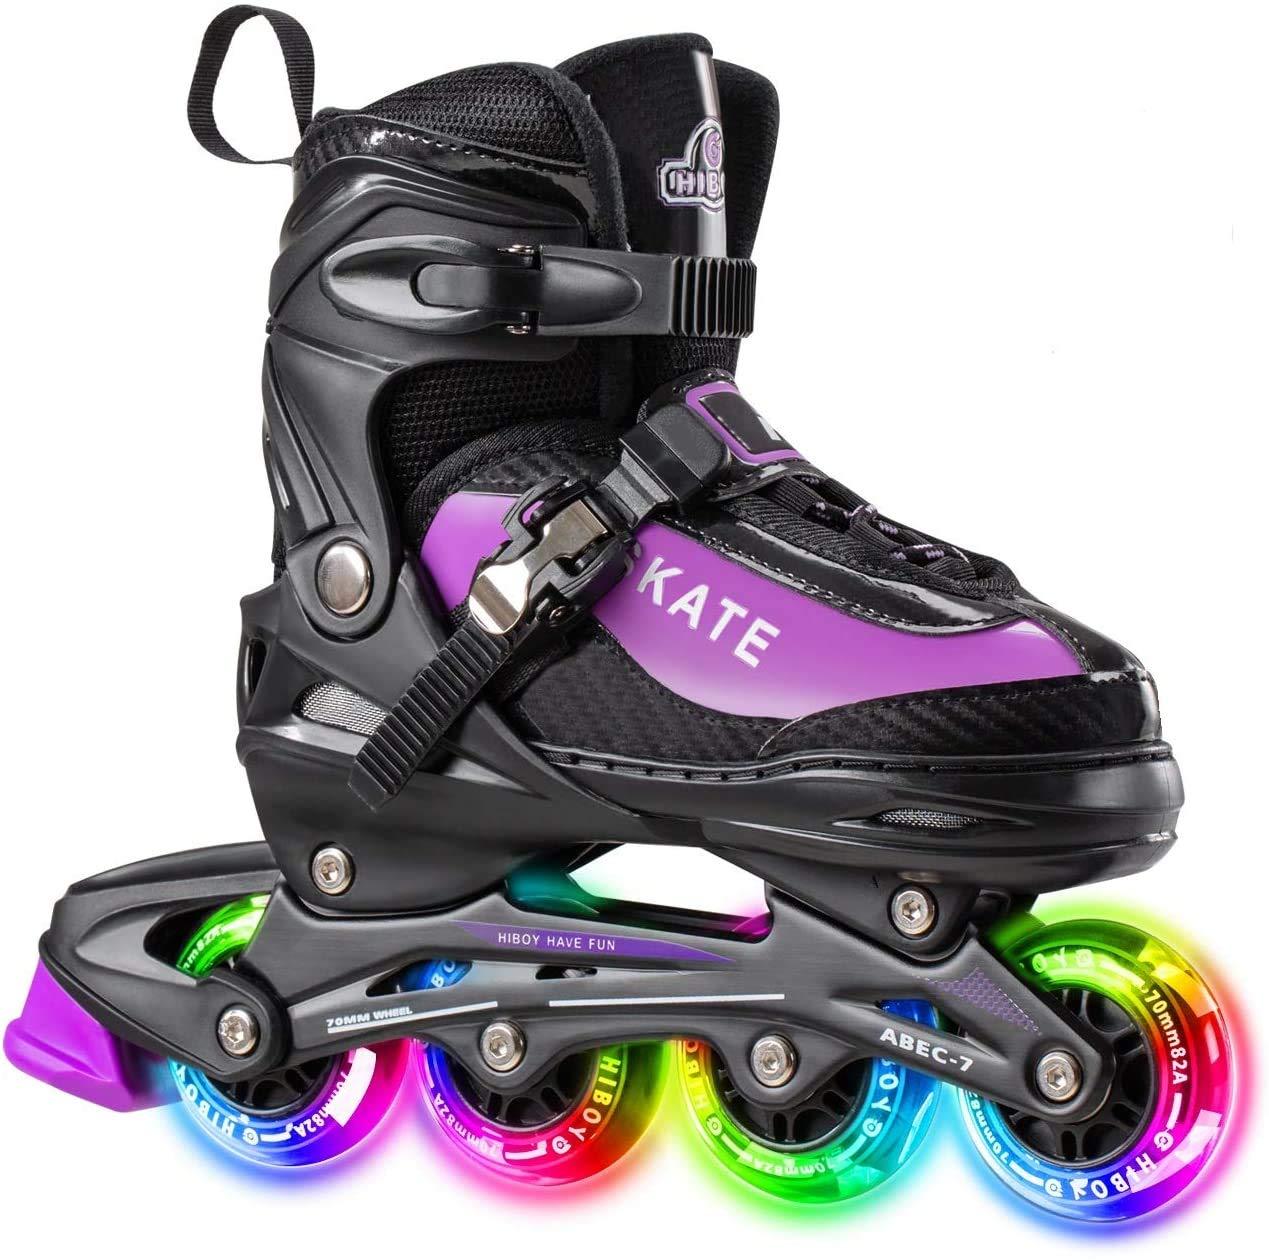 Hiboy Adjustable Inline Skates with All Light up Wheels Outdoor & Indoor